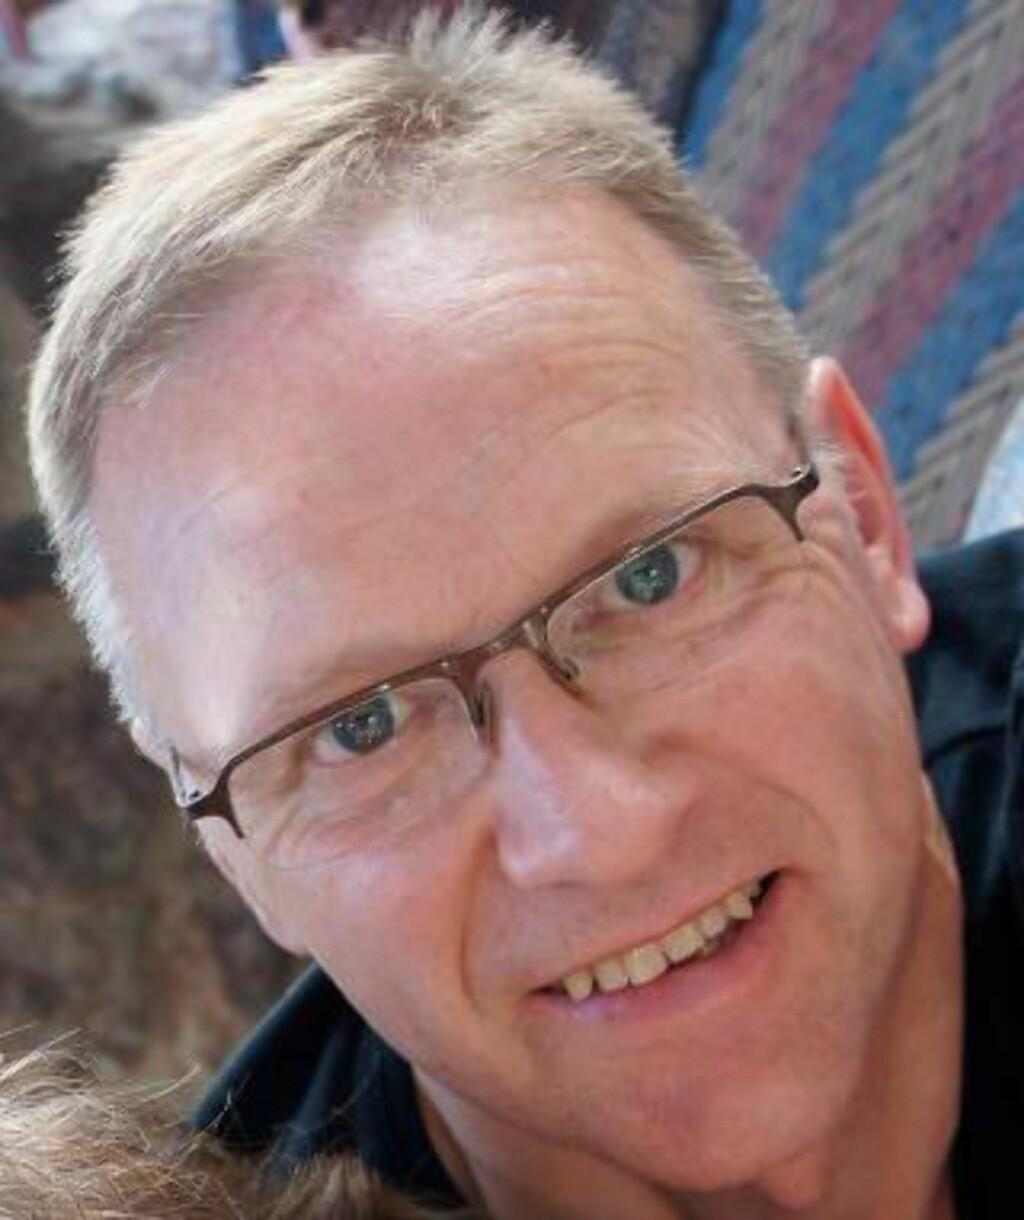 VIER SITT LIV TIL OST: Jan Peter Aursnes skriver om ost på osteperler.no. Foto: Privat